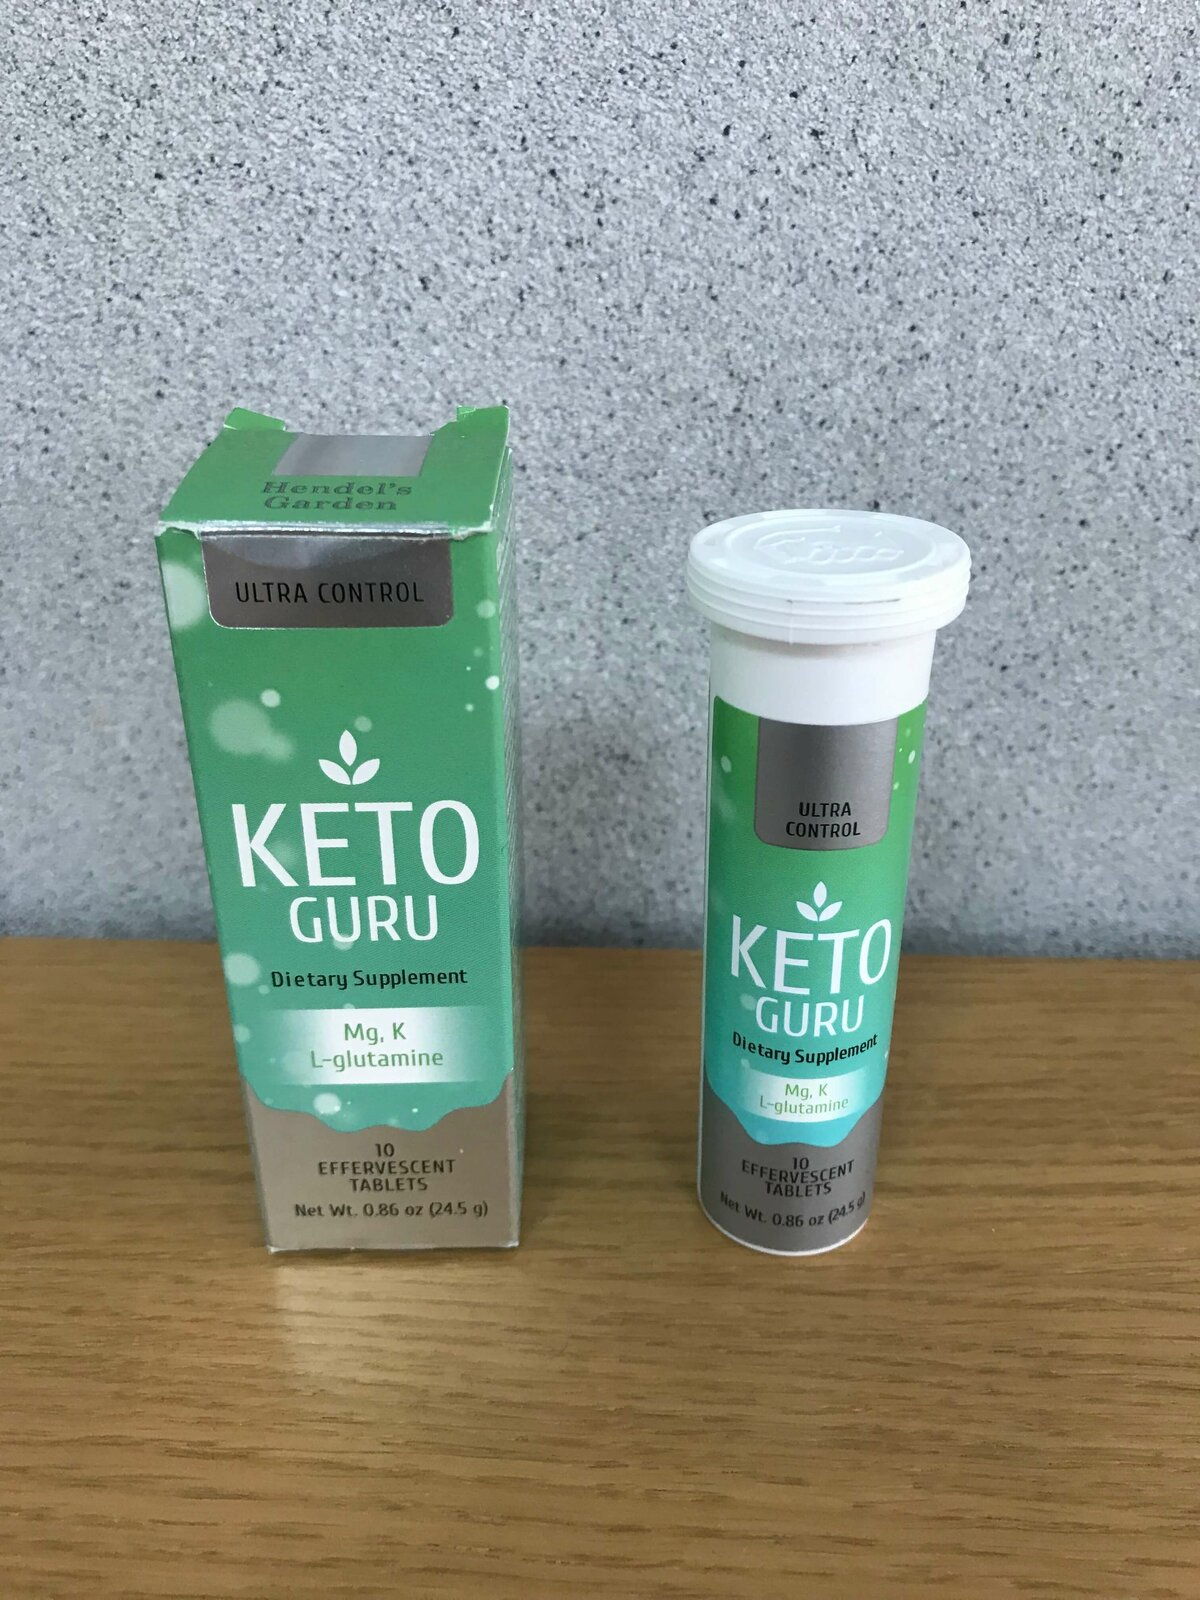 Keto Guru шипучие таблетки для похудения в Находке